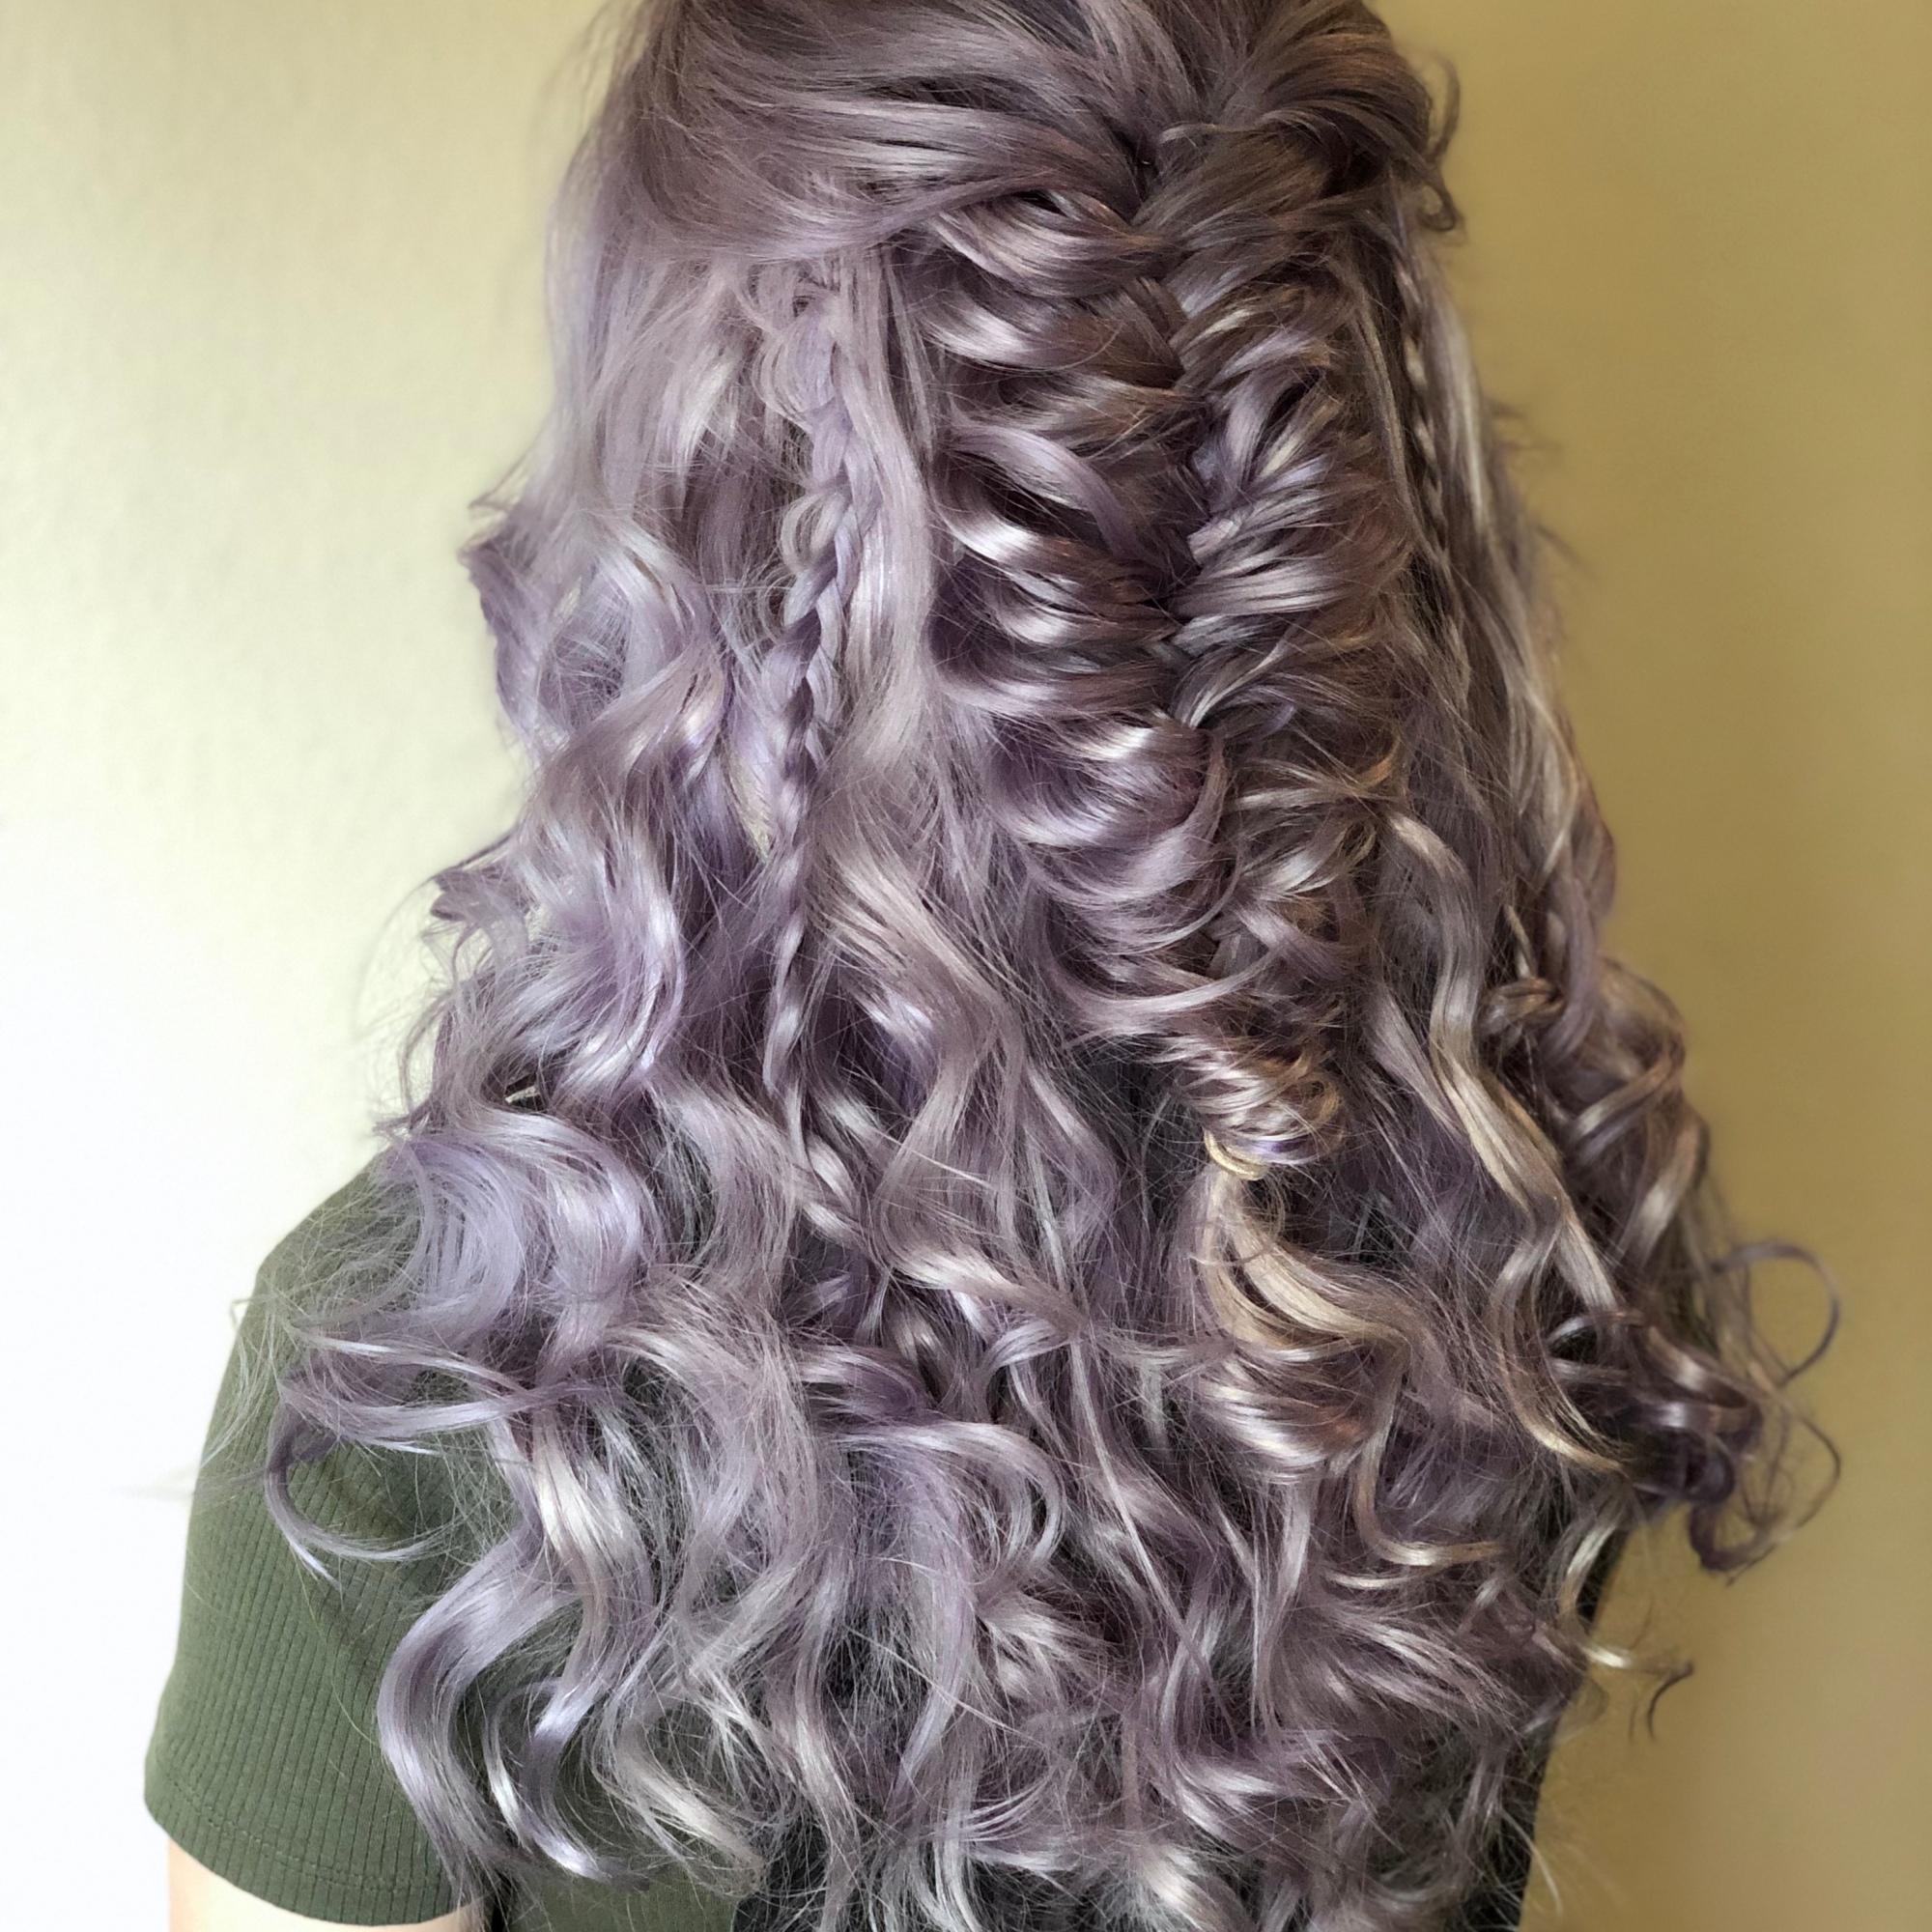 Austin Boho Hair and Makeup